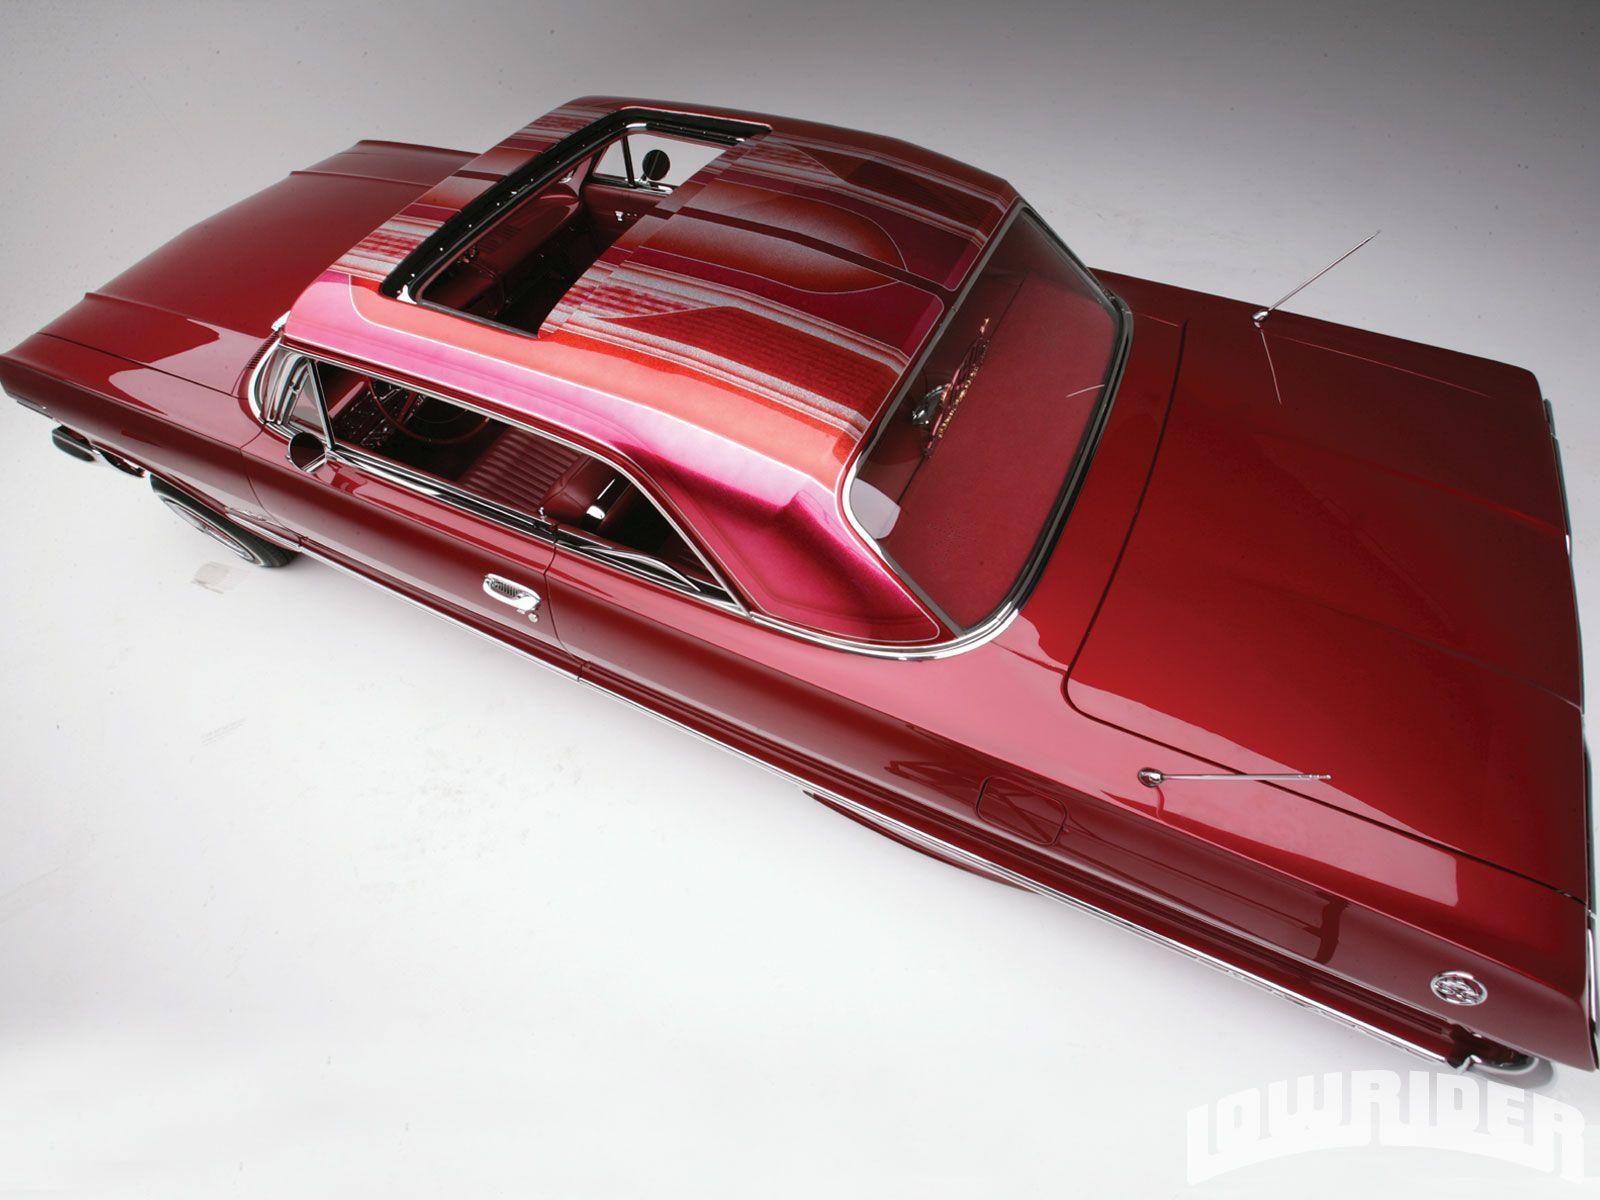 Check out USO Los Angeles member JD Delgado s sweet 1963 Chevrolet